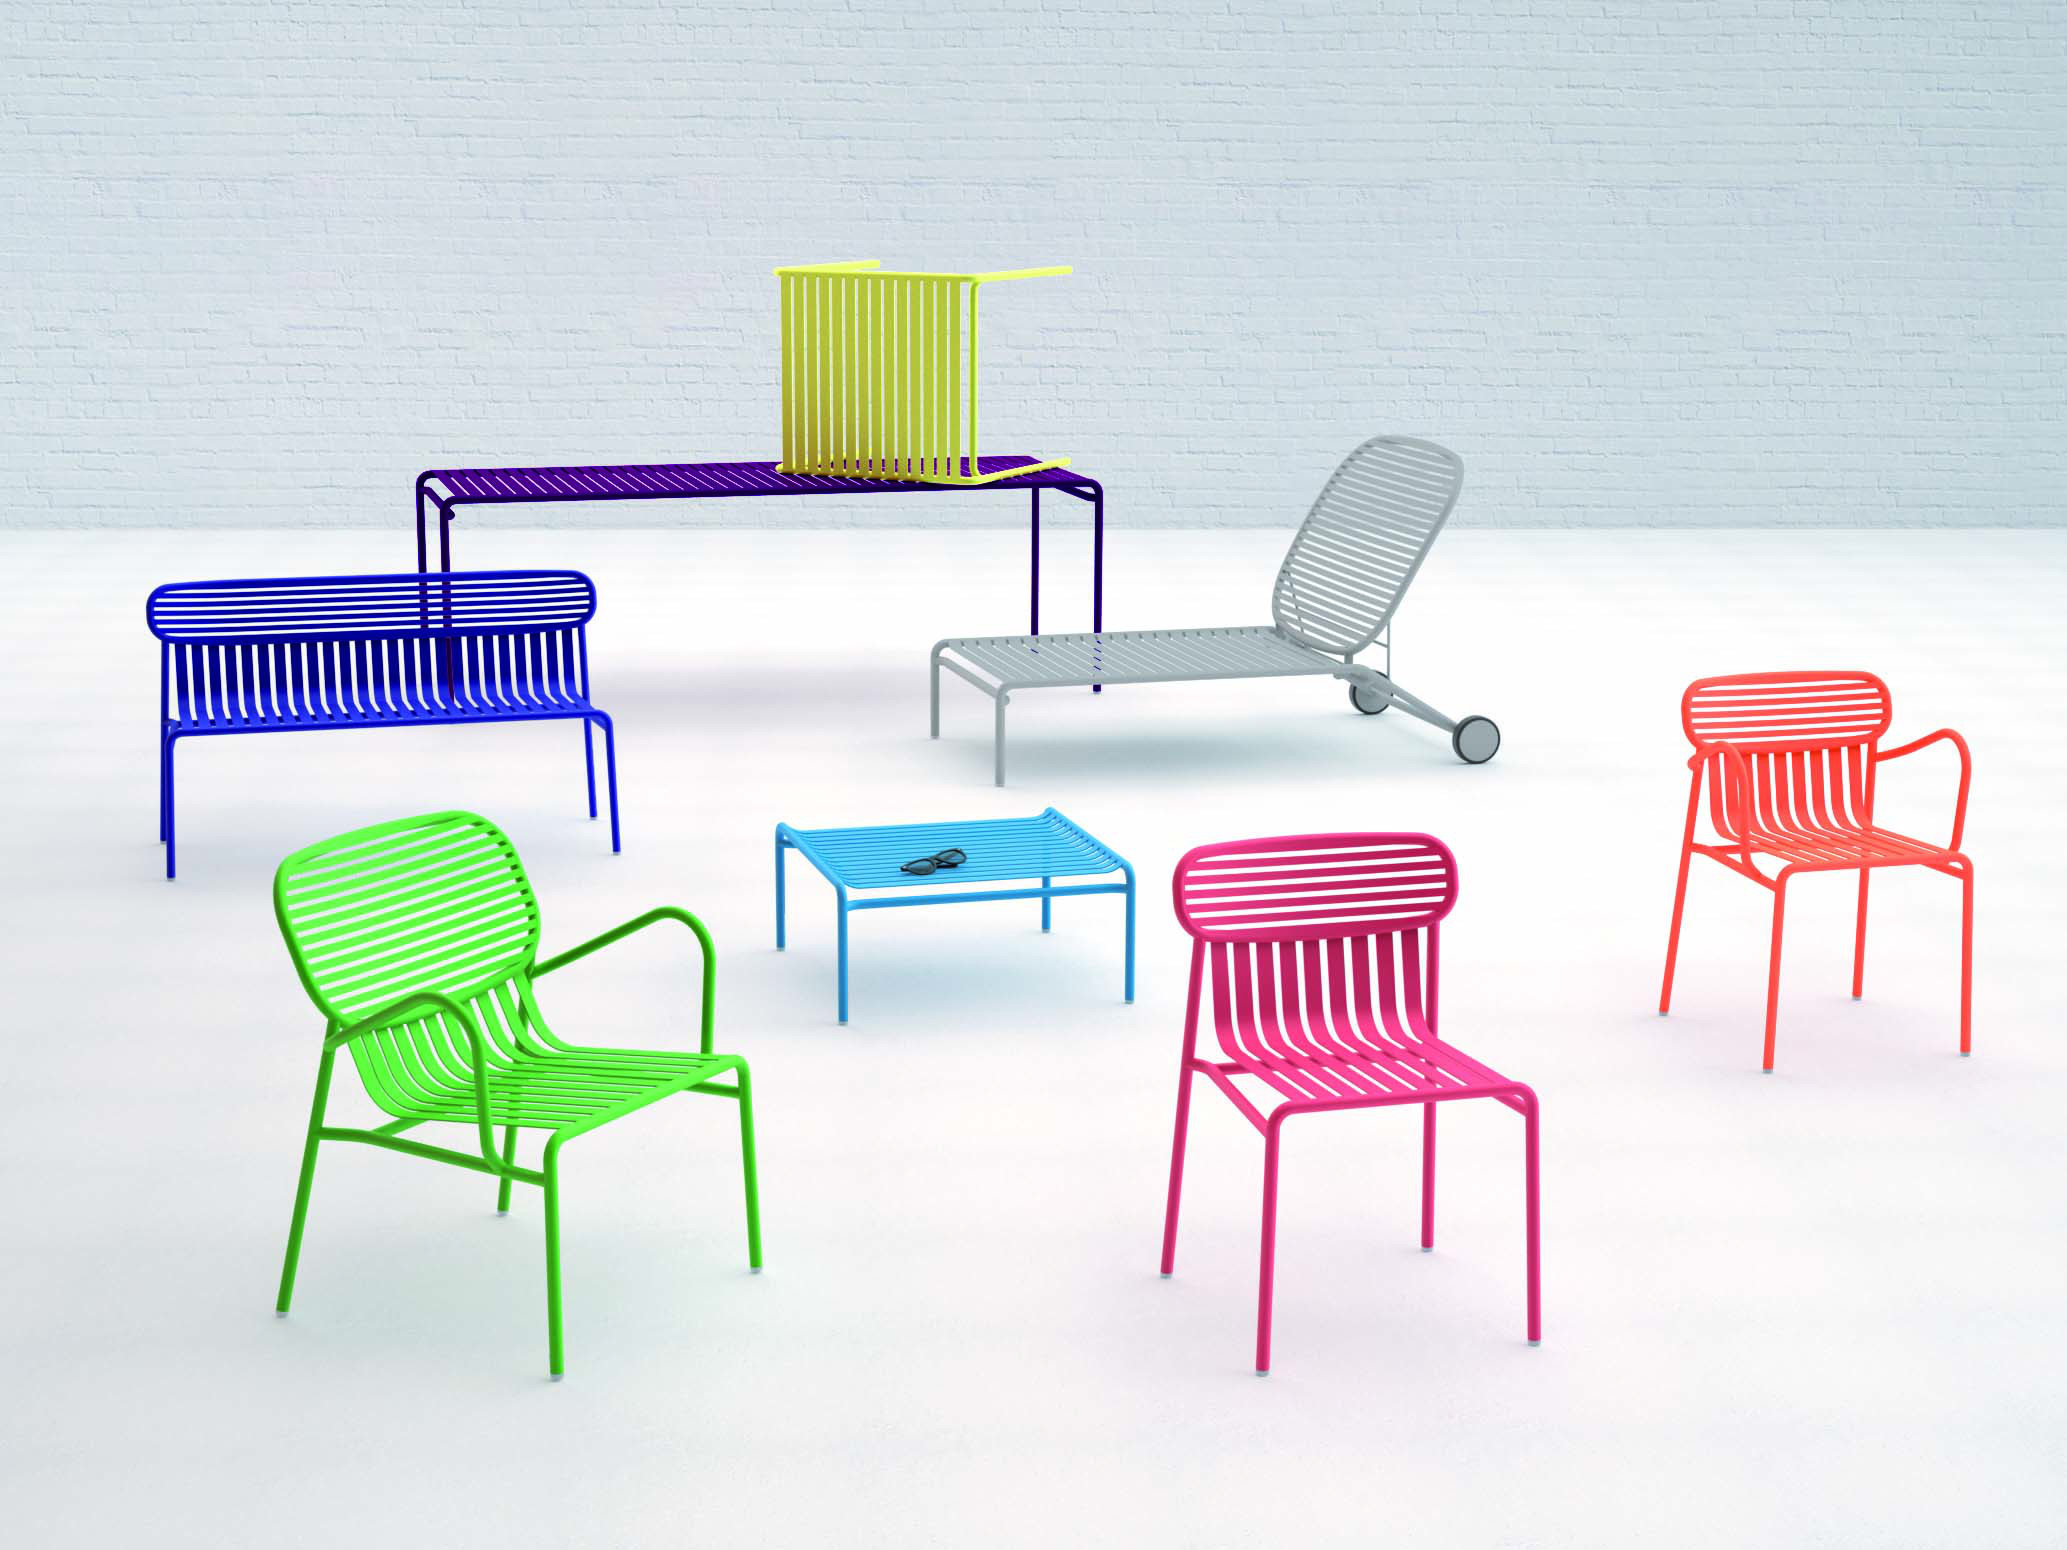 seria nowoczesnych mebli ogrodowych meble metalowe. Black Bedroom Furniture Sets. Home Design Ideas